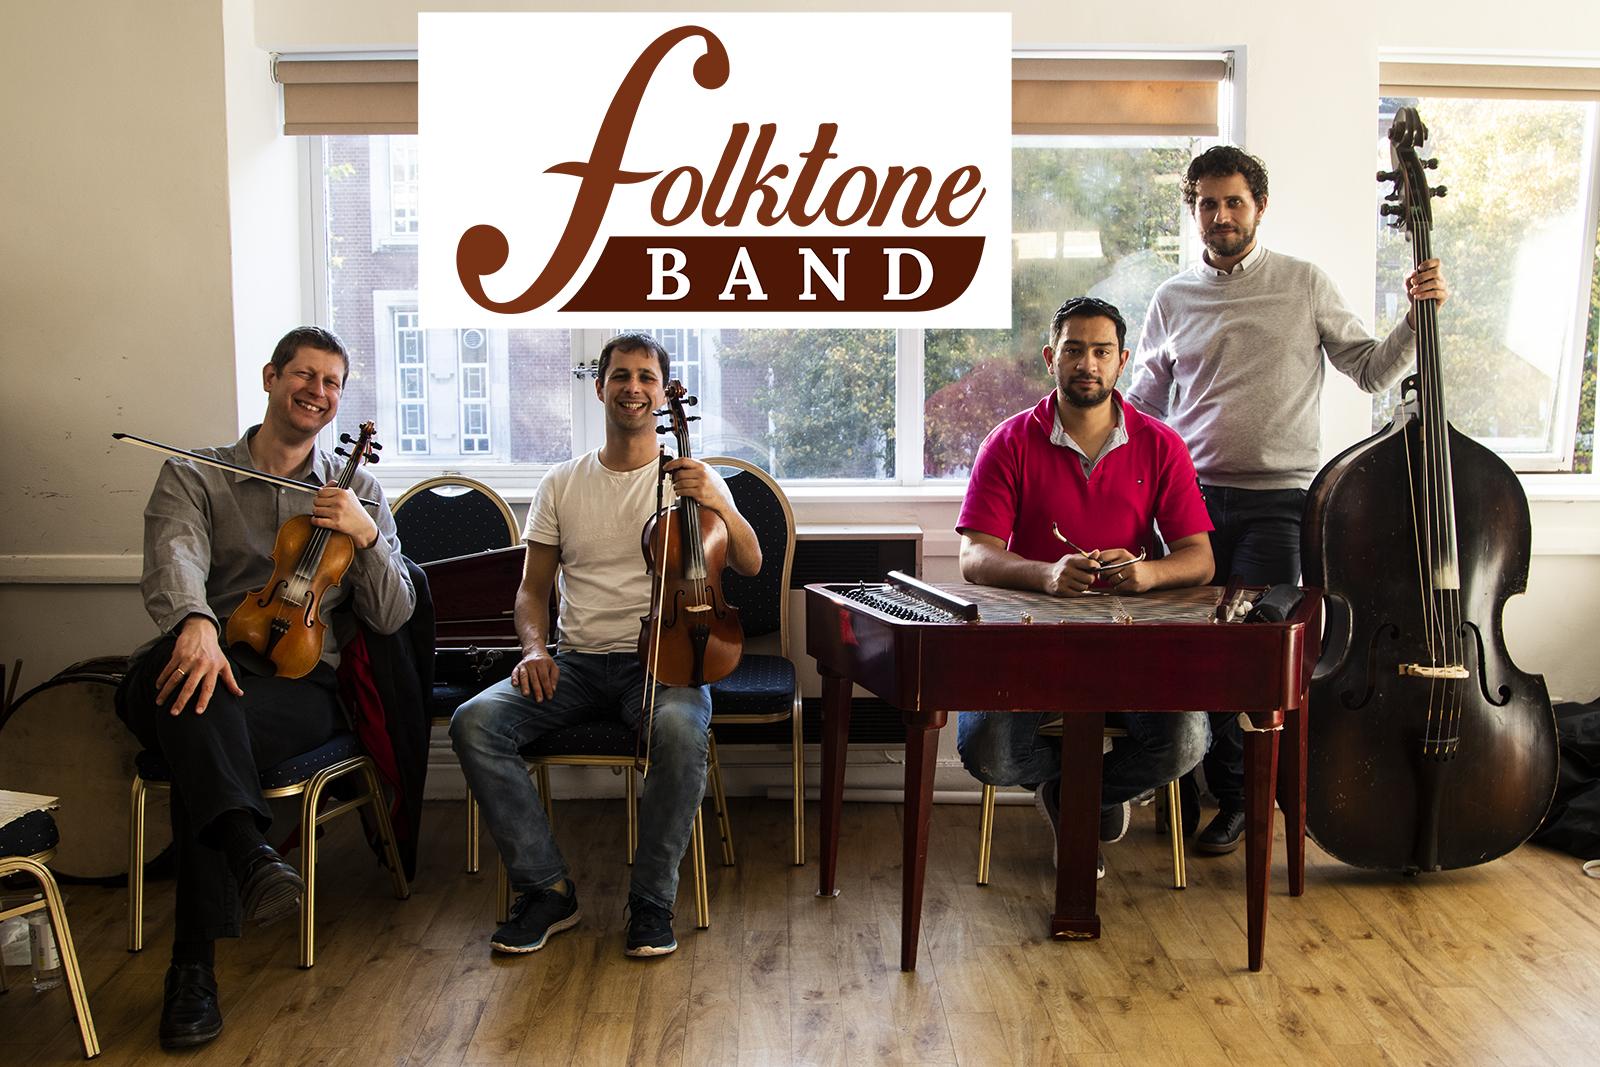 Folktone Band